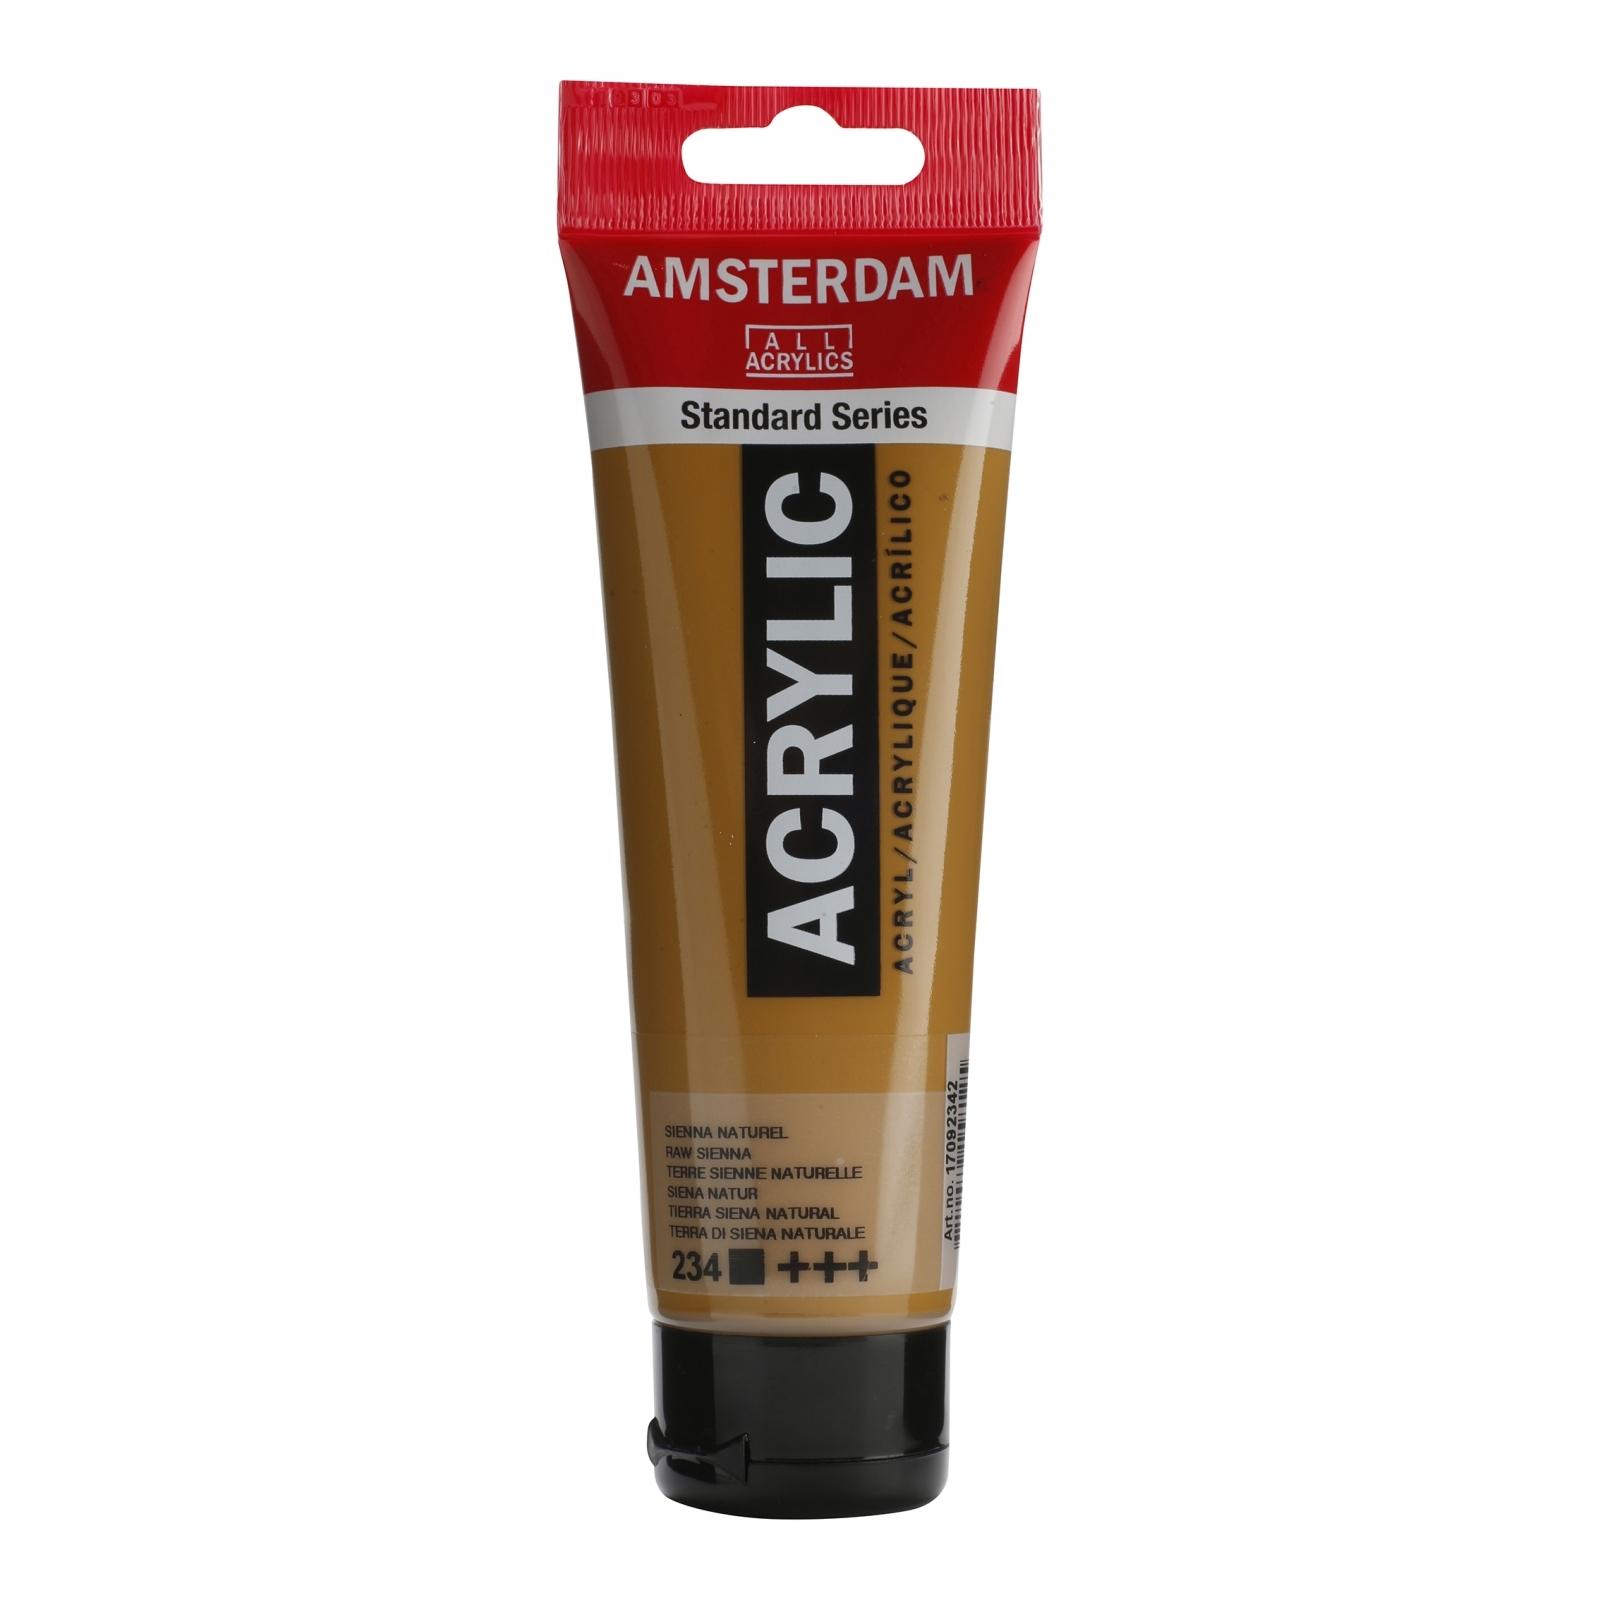 Tinta Acrílica Amsterdam Sienna Natural 120ml (+++234) - Papelaria Botafogo